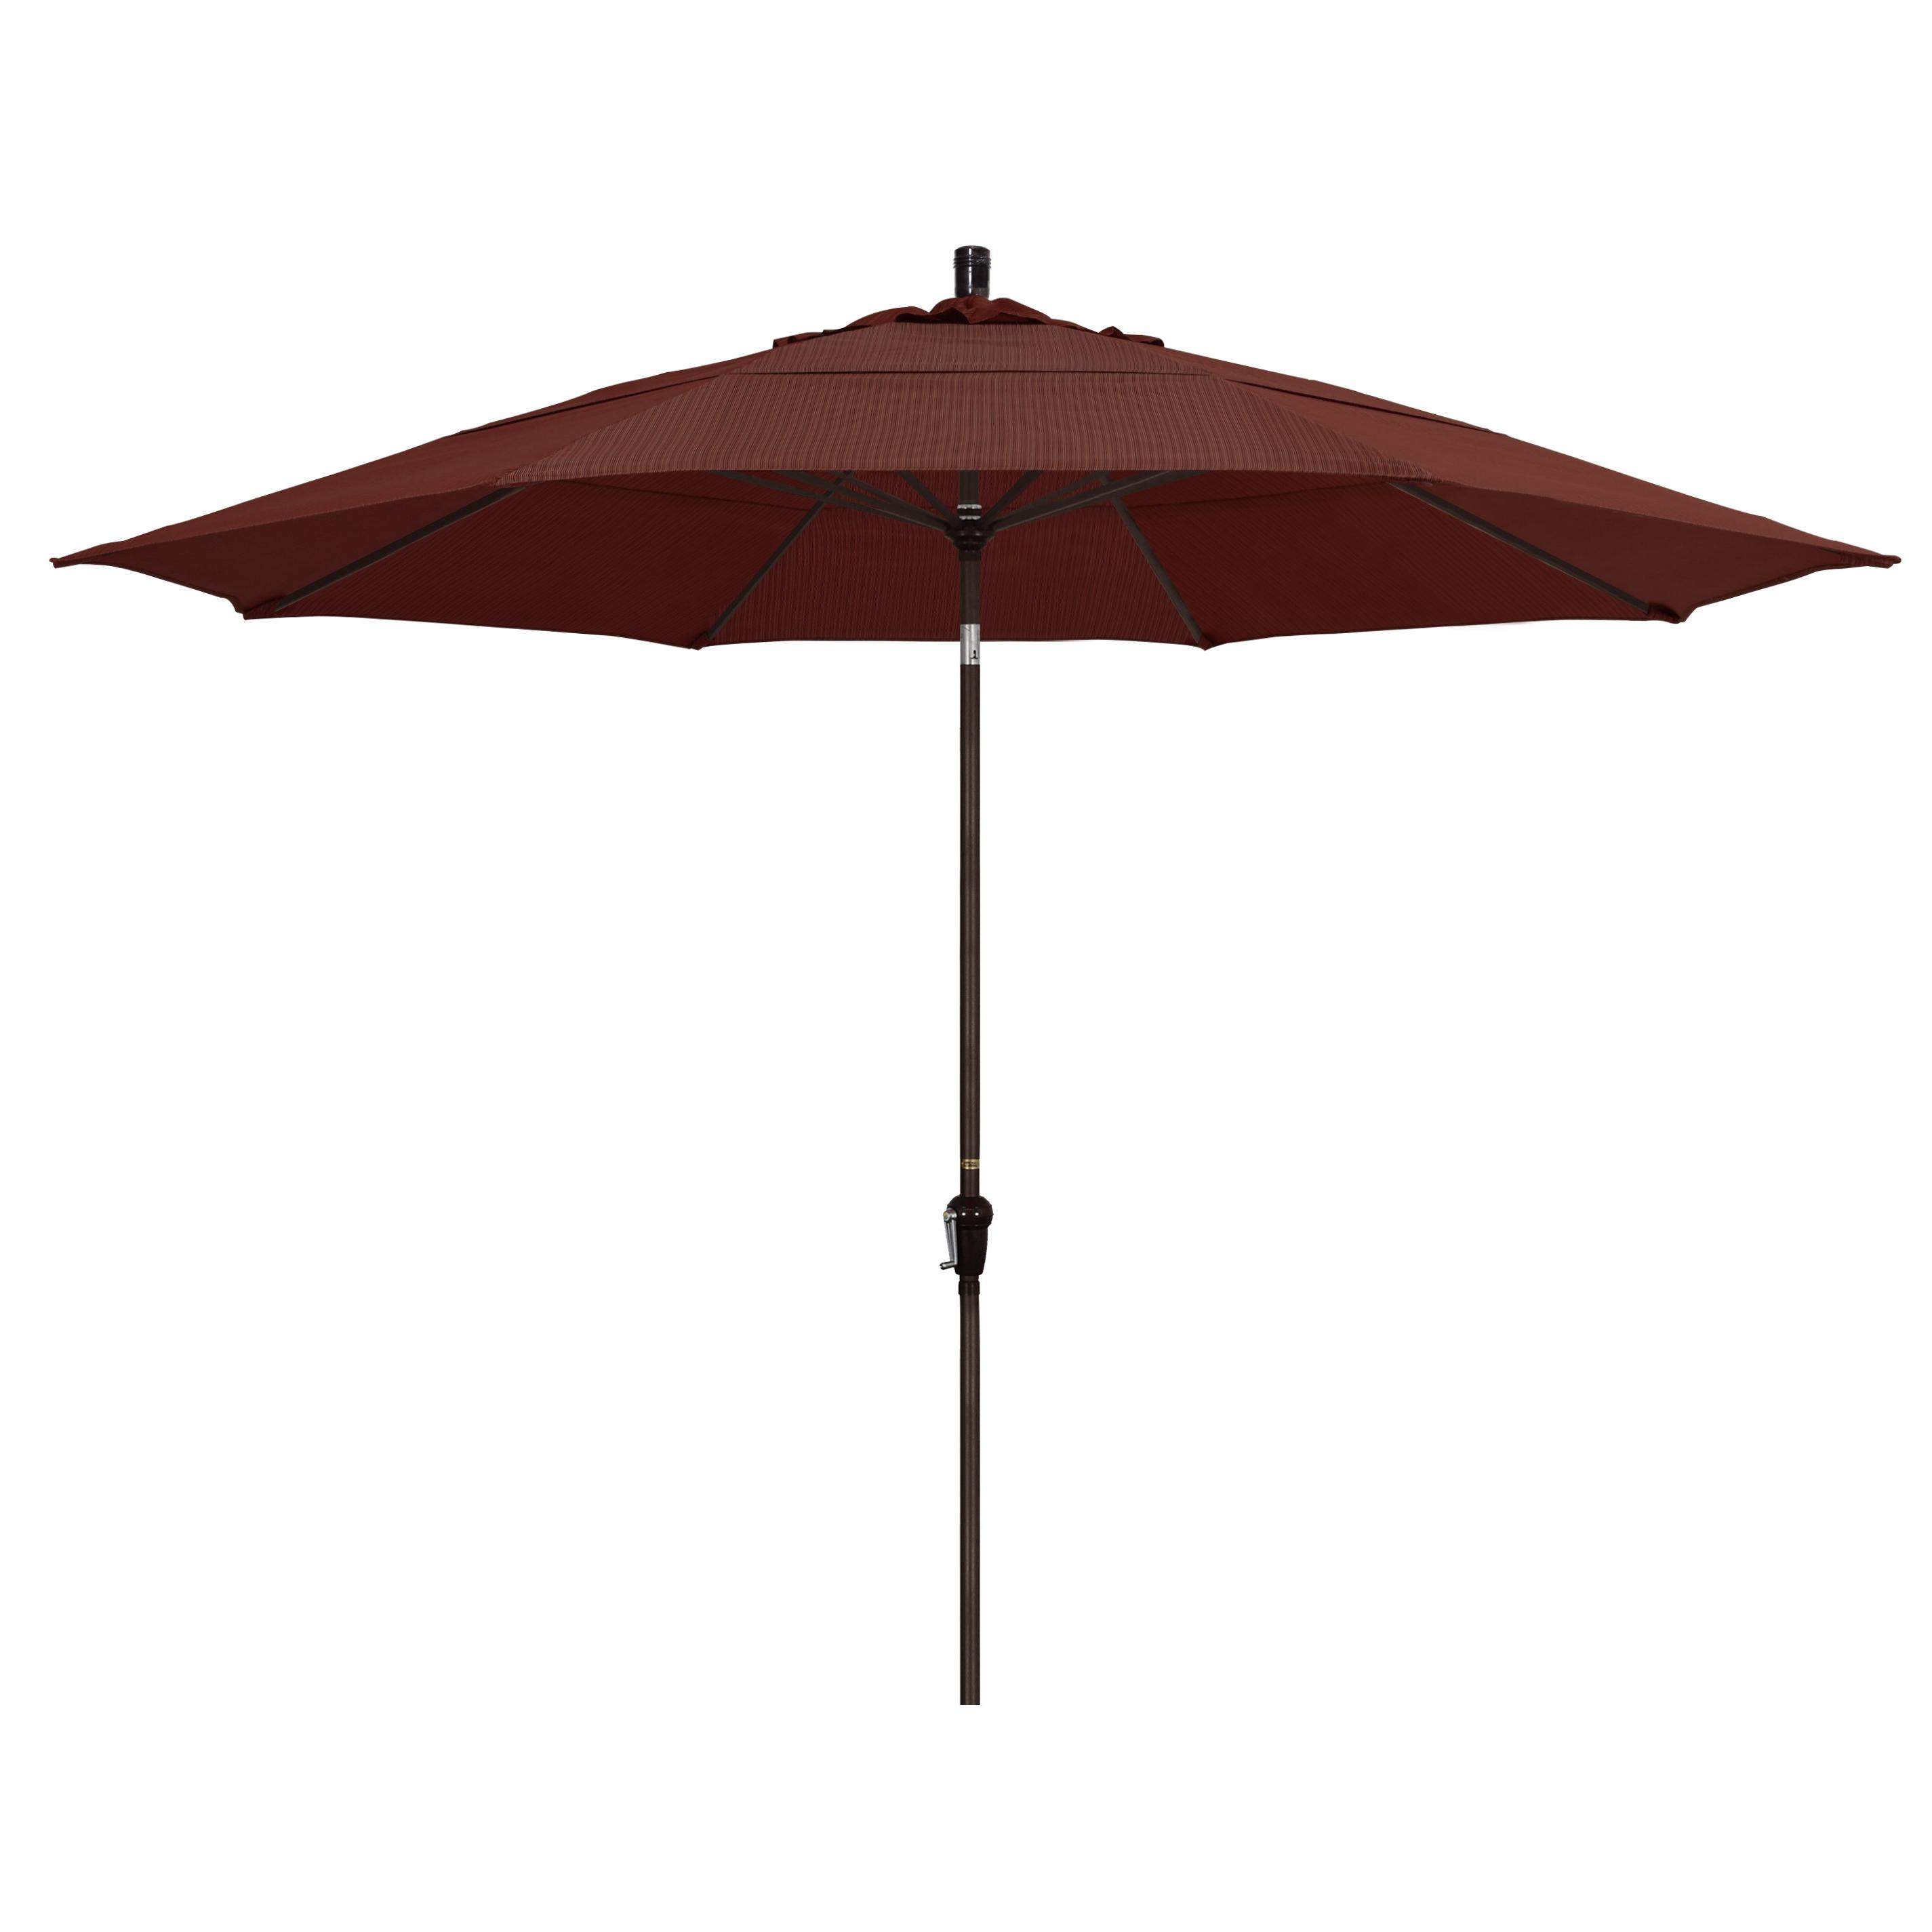 Mullaney Market Umbrellas Intended For Well Liked Mullaney 11' Market Umbrella (View 5 of 20)